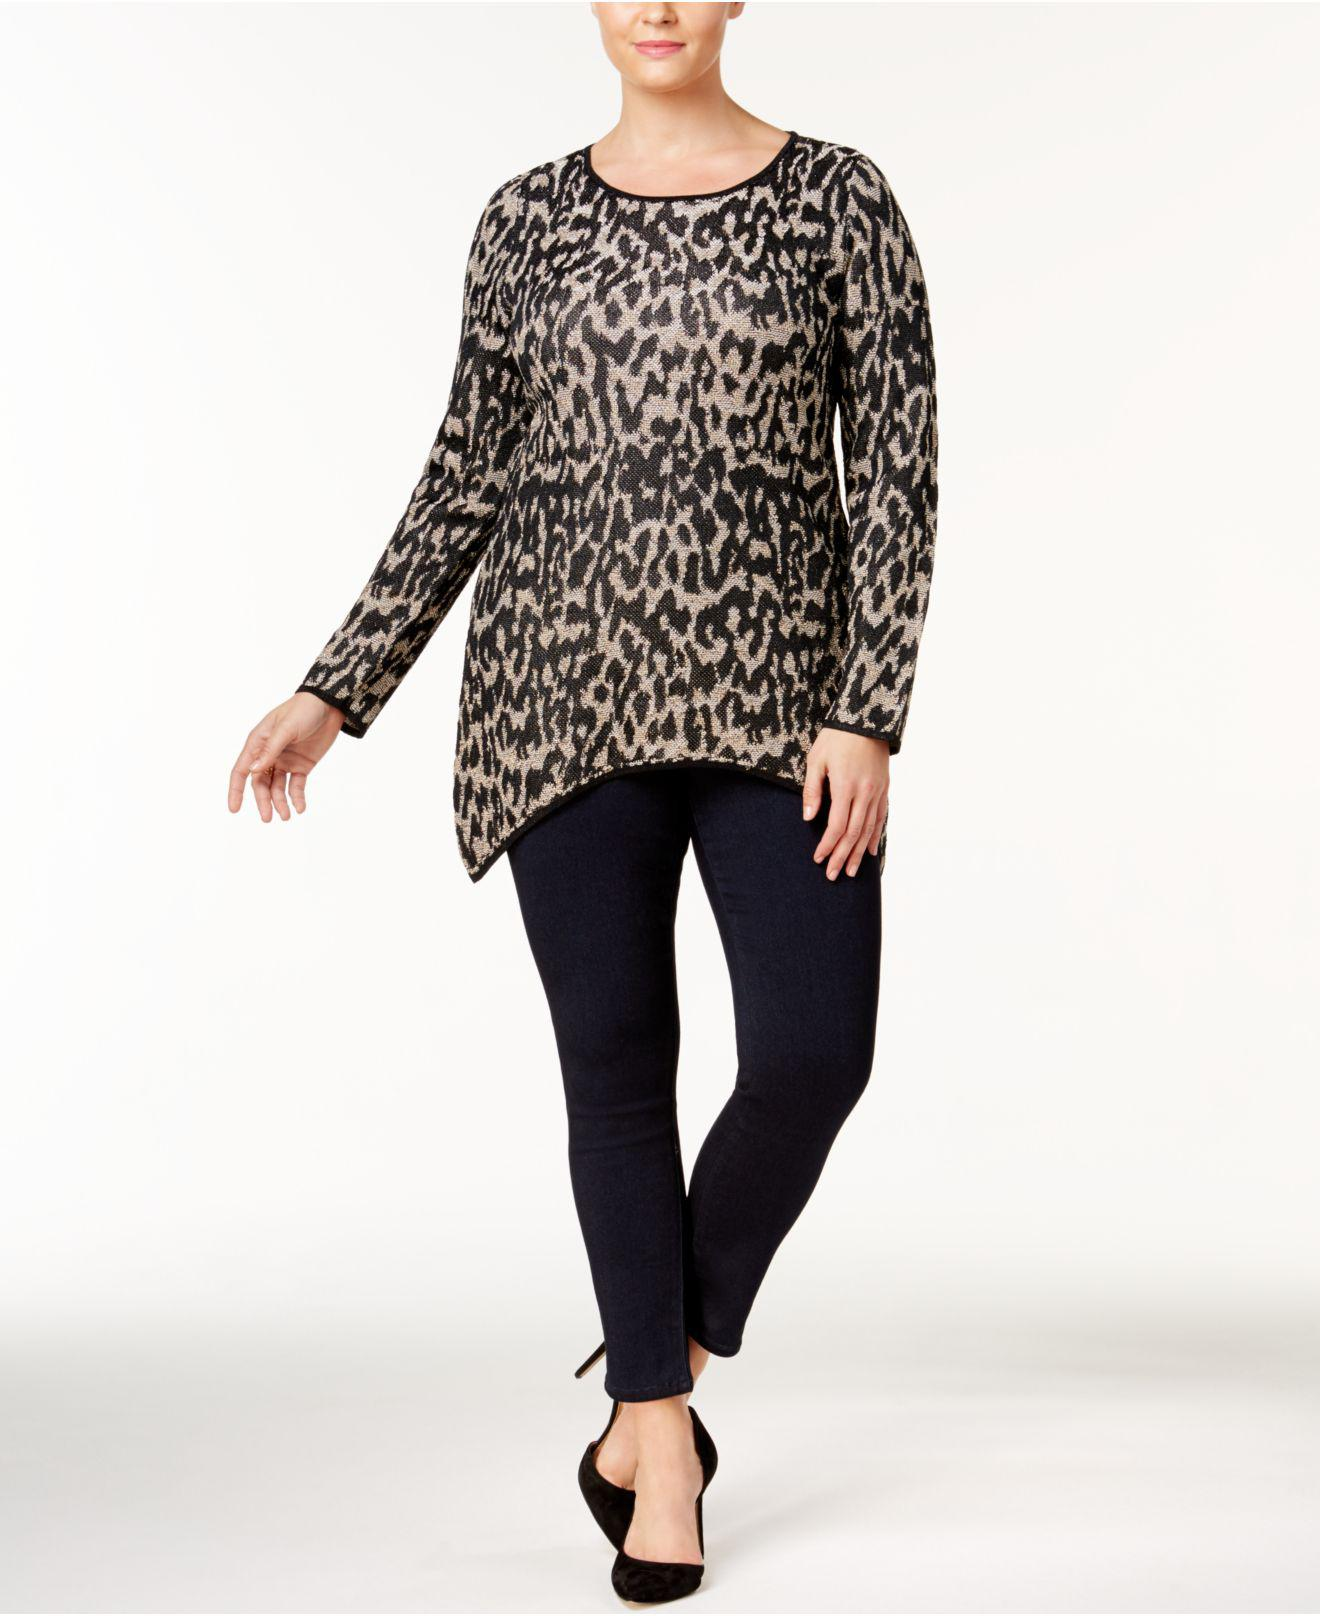 6c9befa5ae4 Lyst - Inc International Concepts Plus Size Leopard-print Tunic in Black